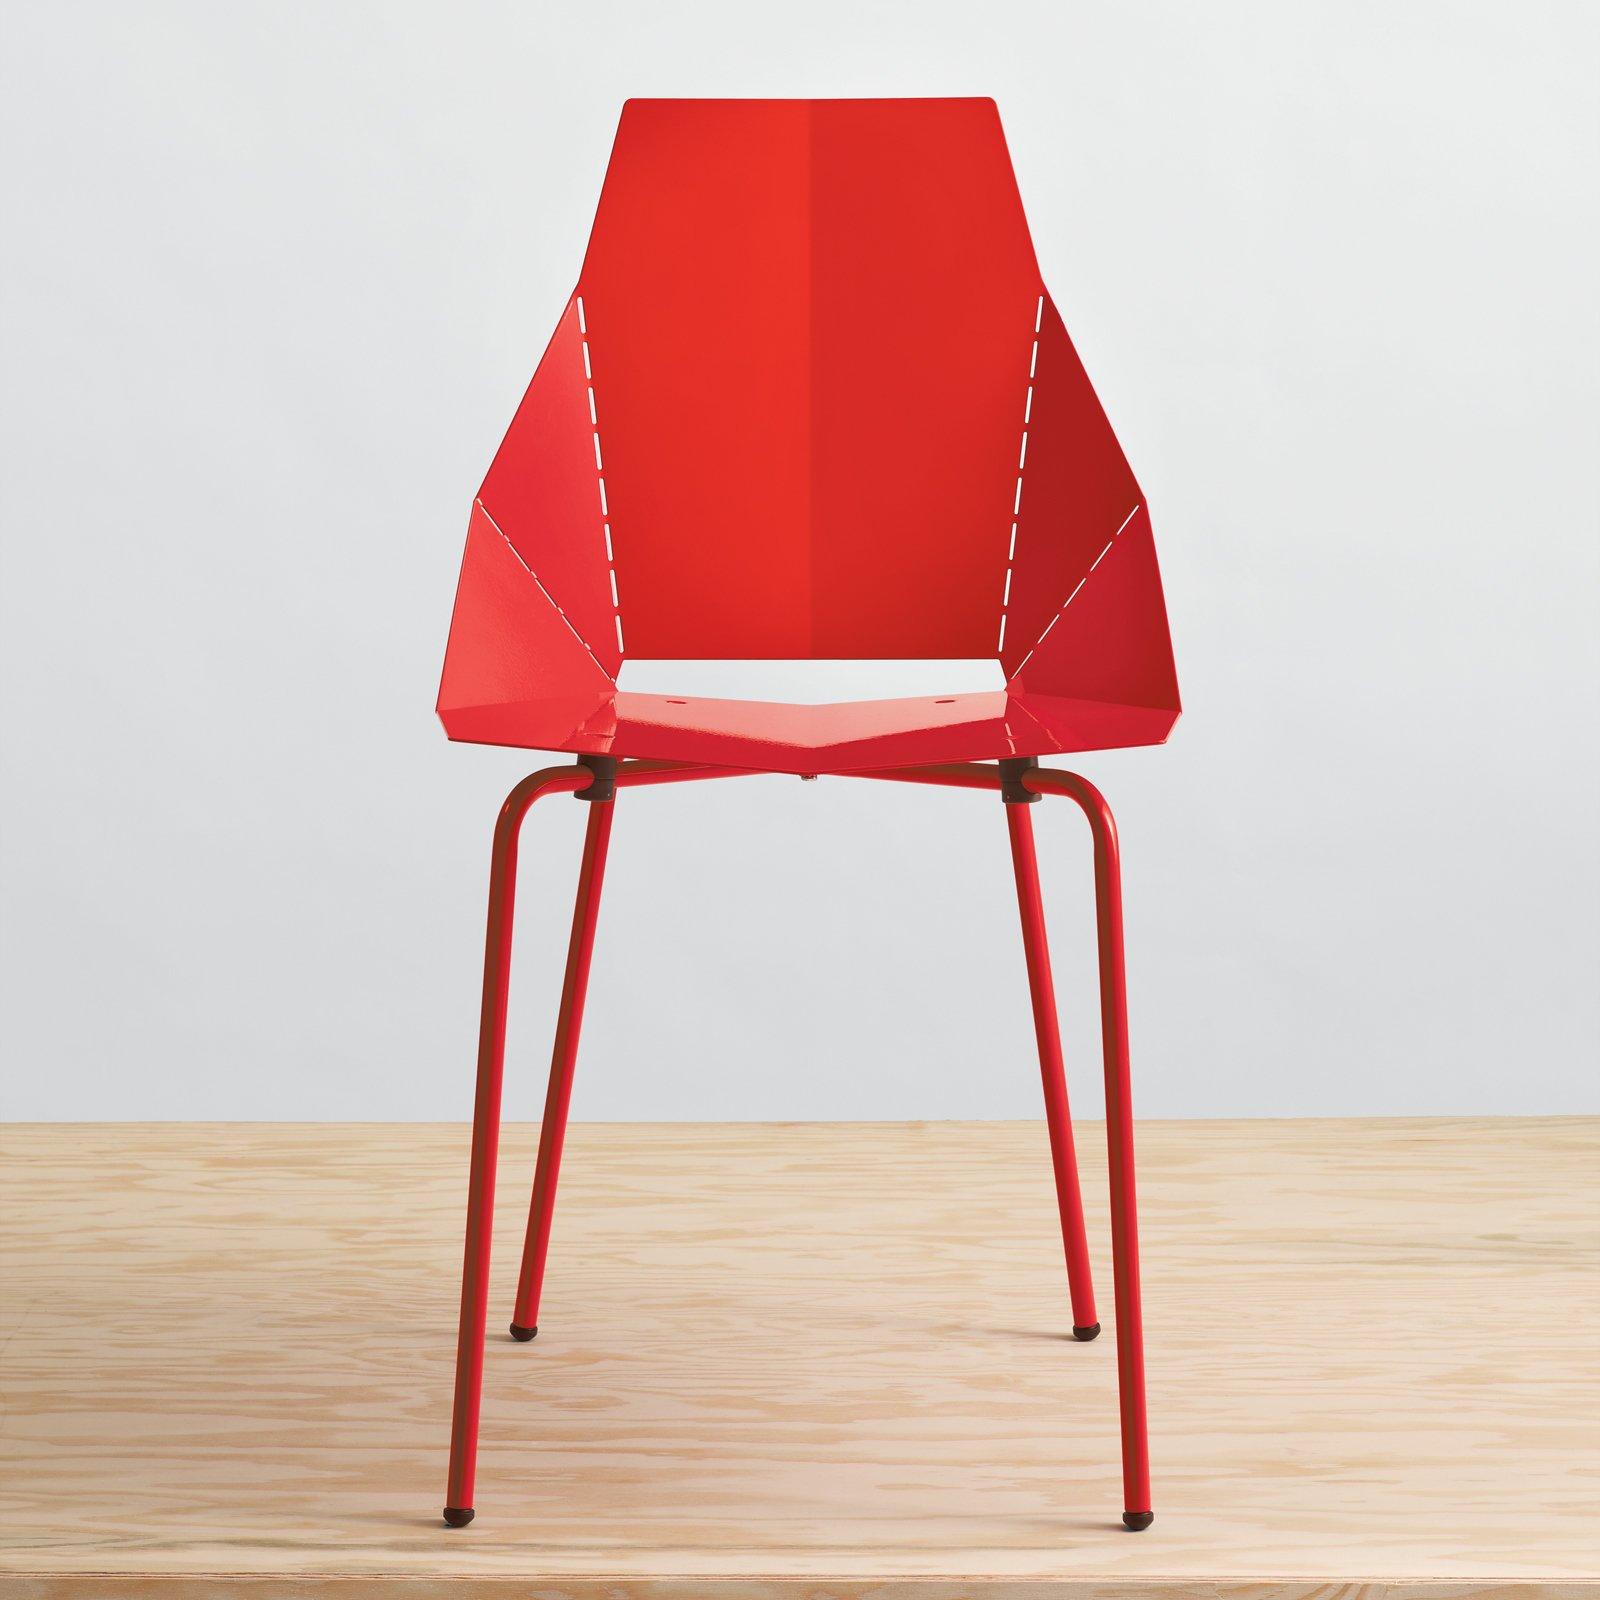 #seatingdesign #red #modern #chair #RealGoodChair #bright #BluDot #sculptural   100+ Best Modern Seating Designs